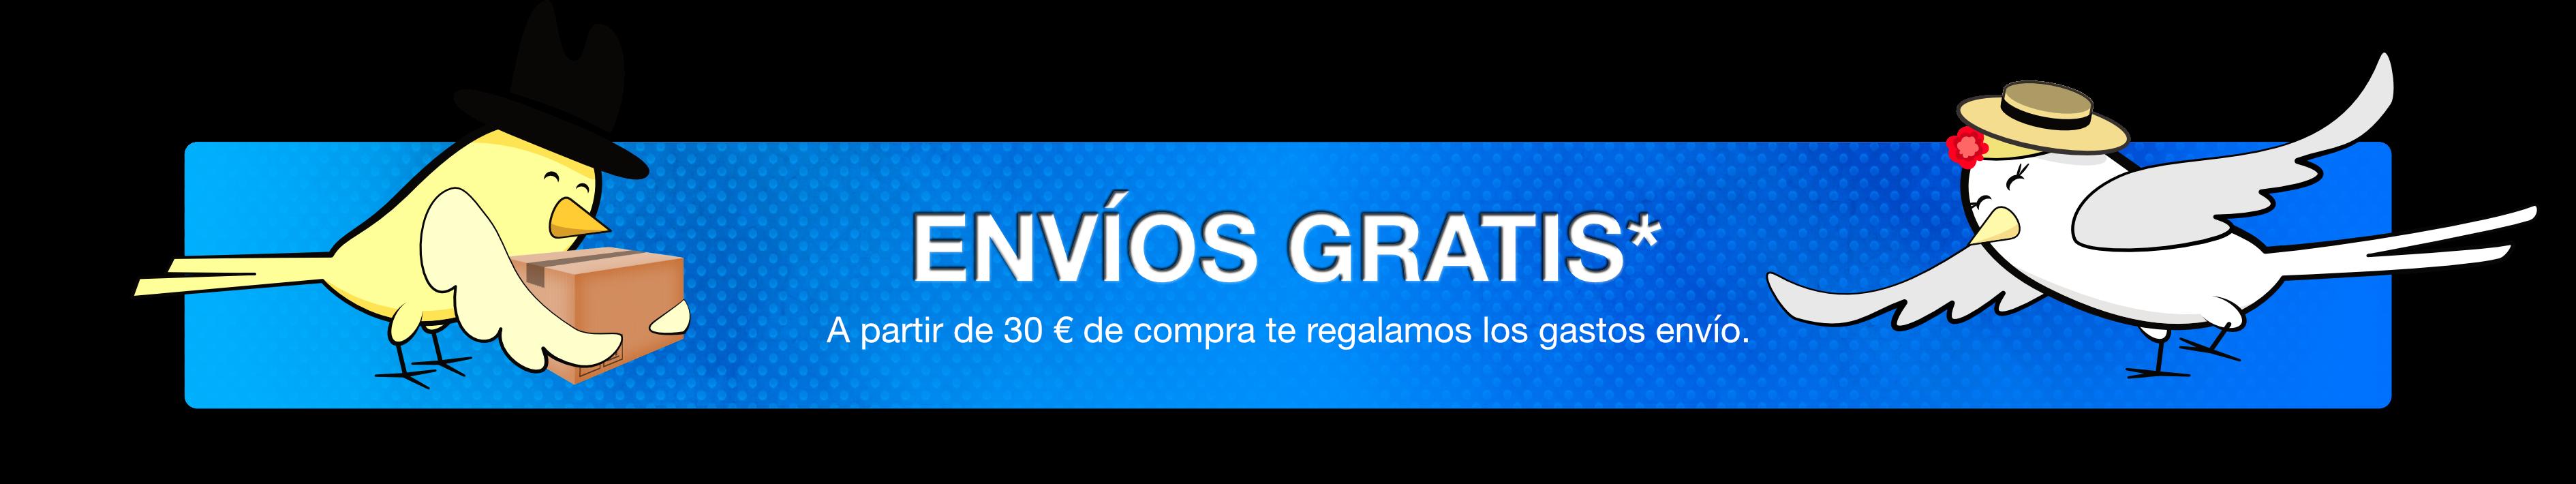 Envíos gratis gr